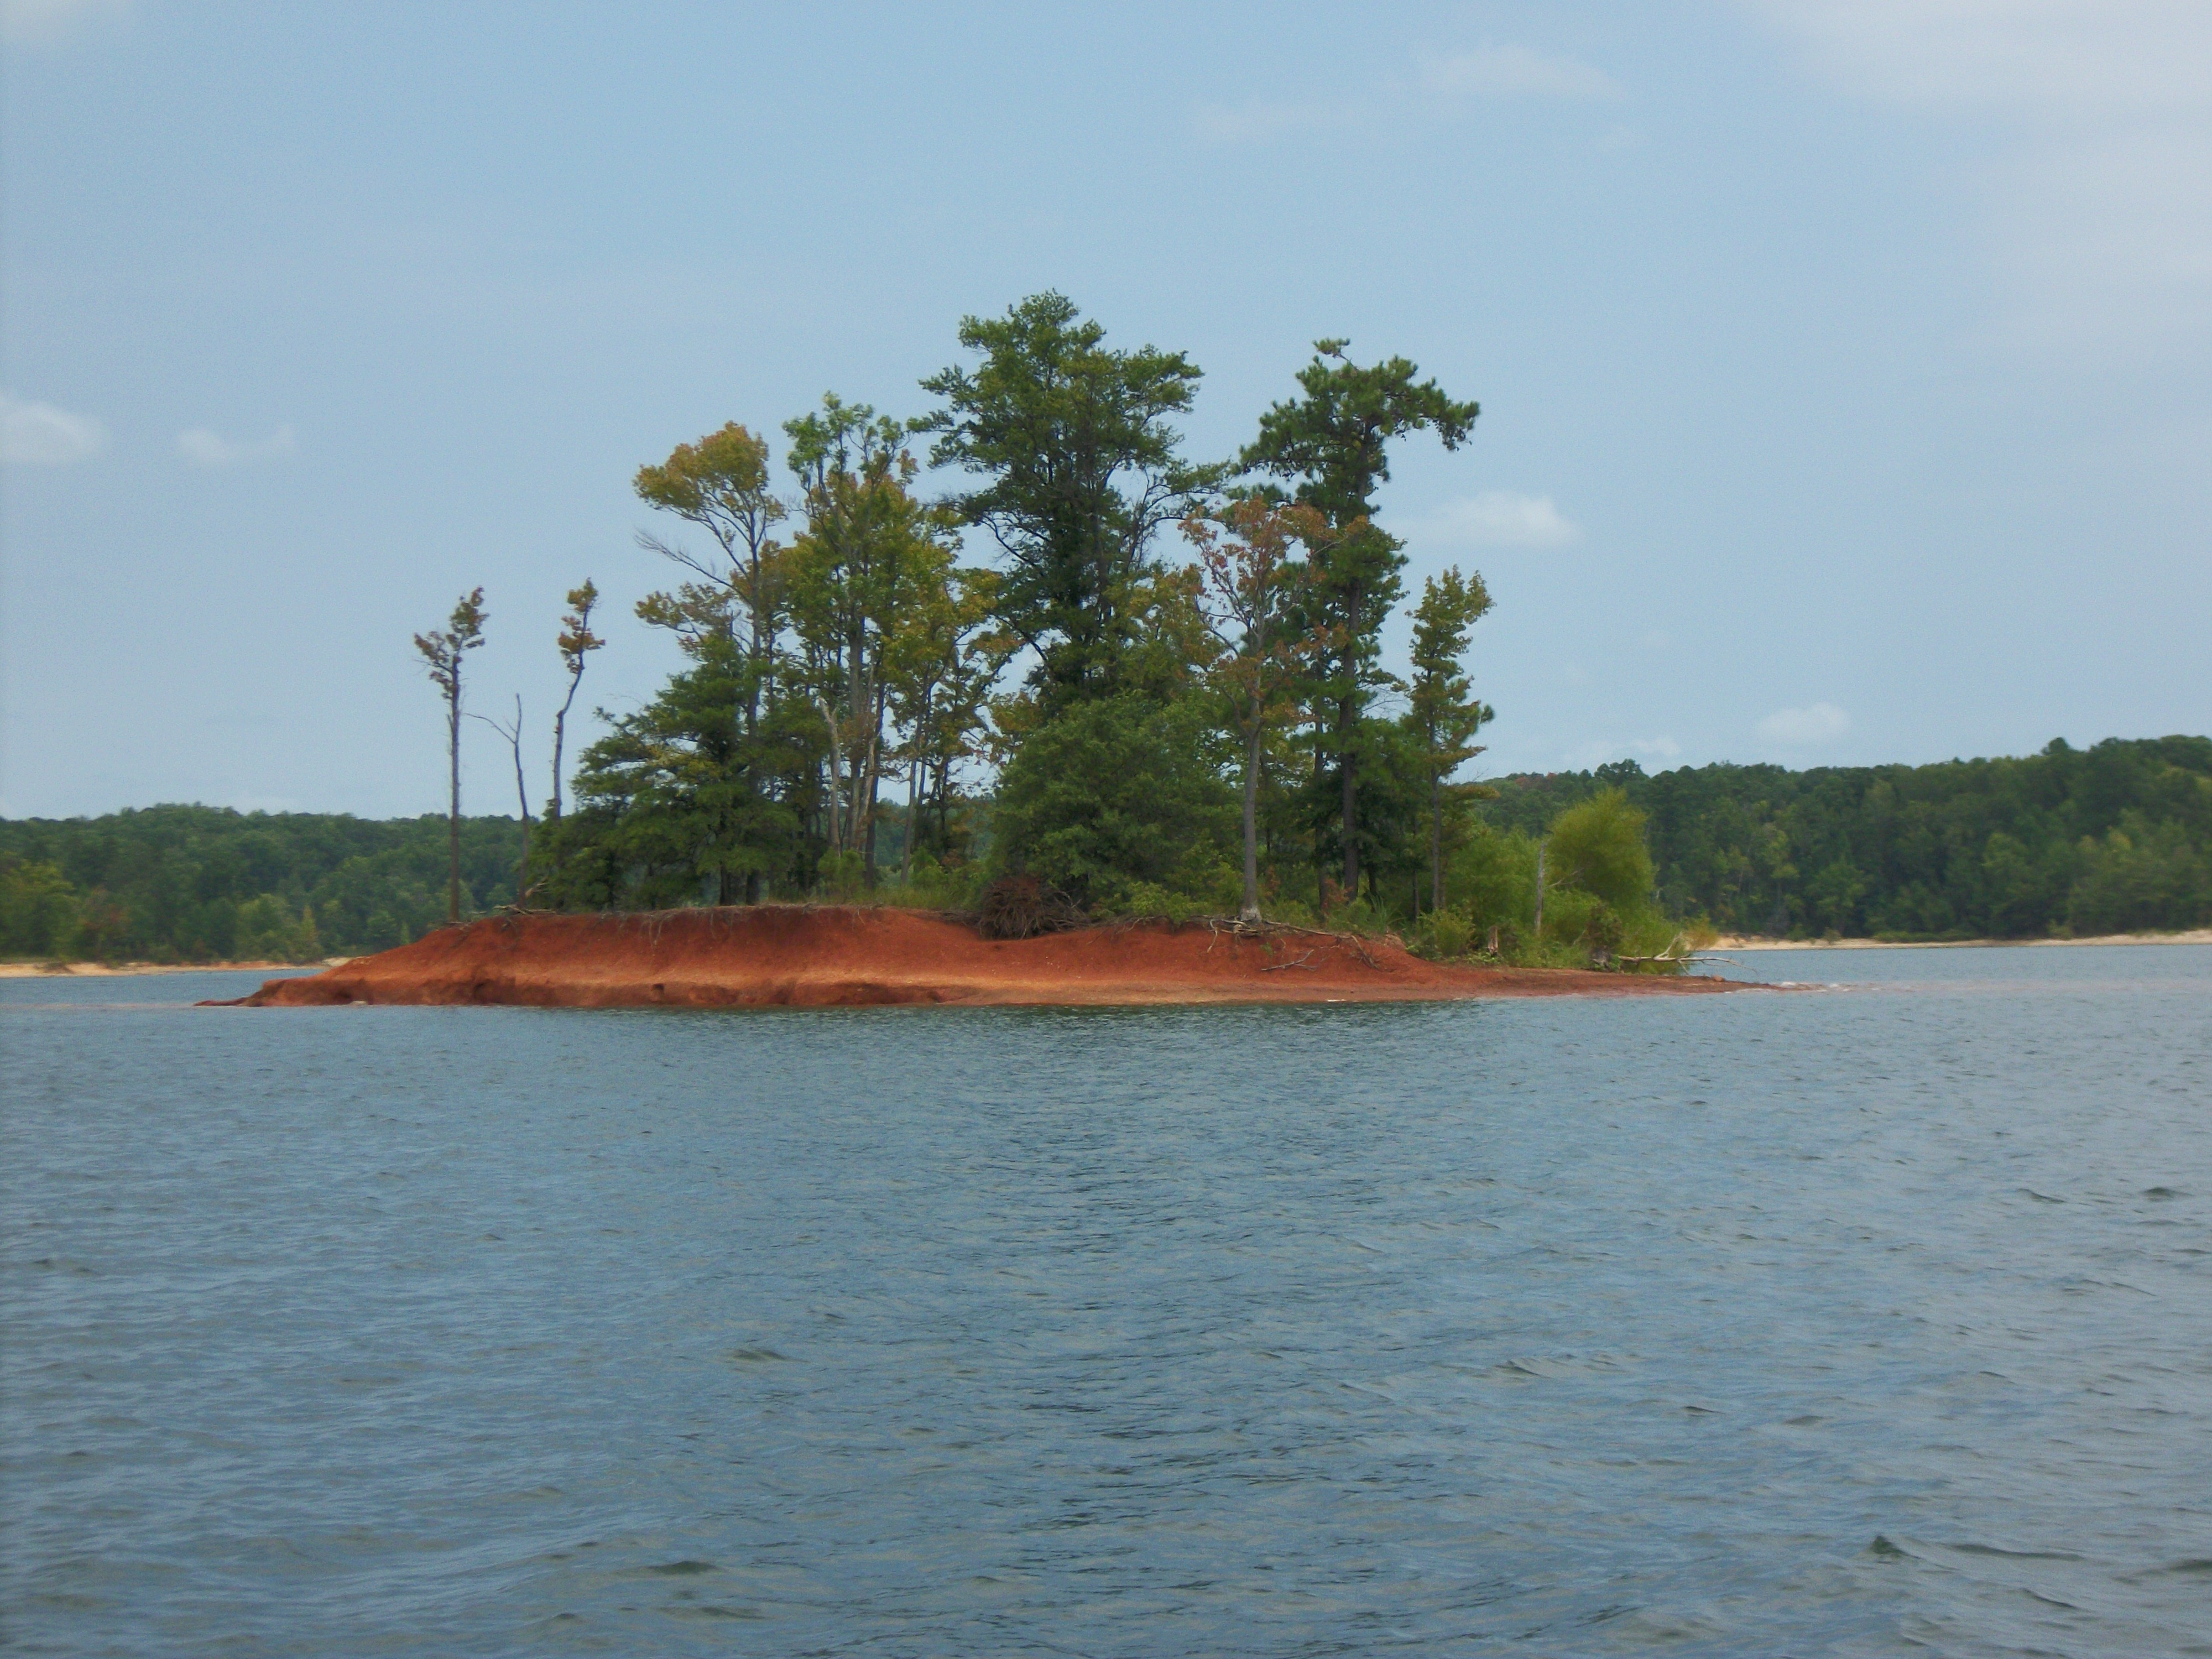 be17f7be030f3 File:Lake Kerr Gilligan's Island 36.595029,-78.390841 - panoramio.jpg